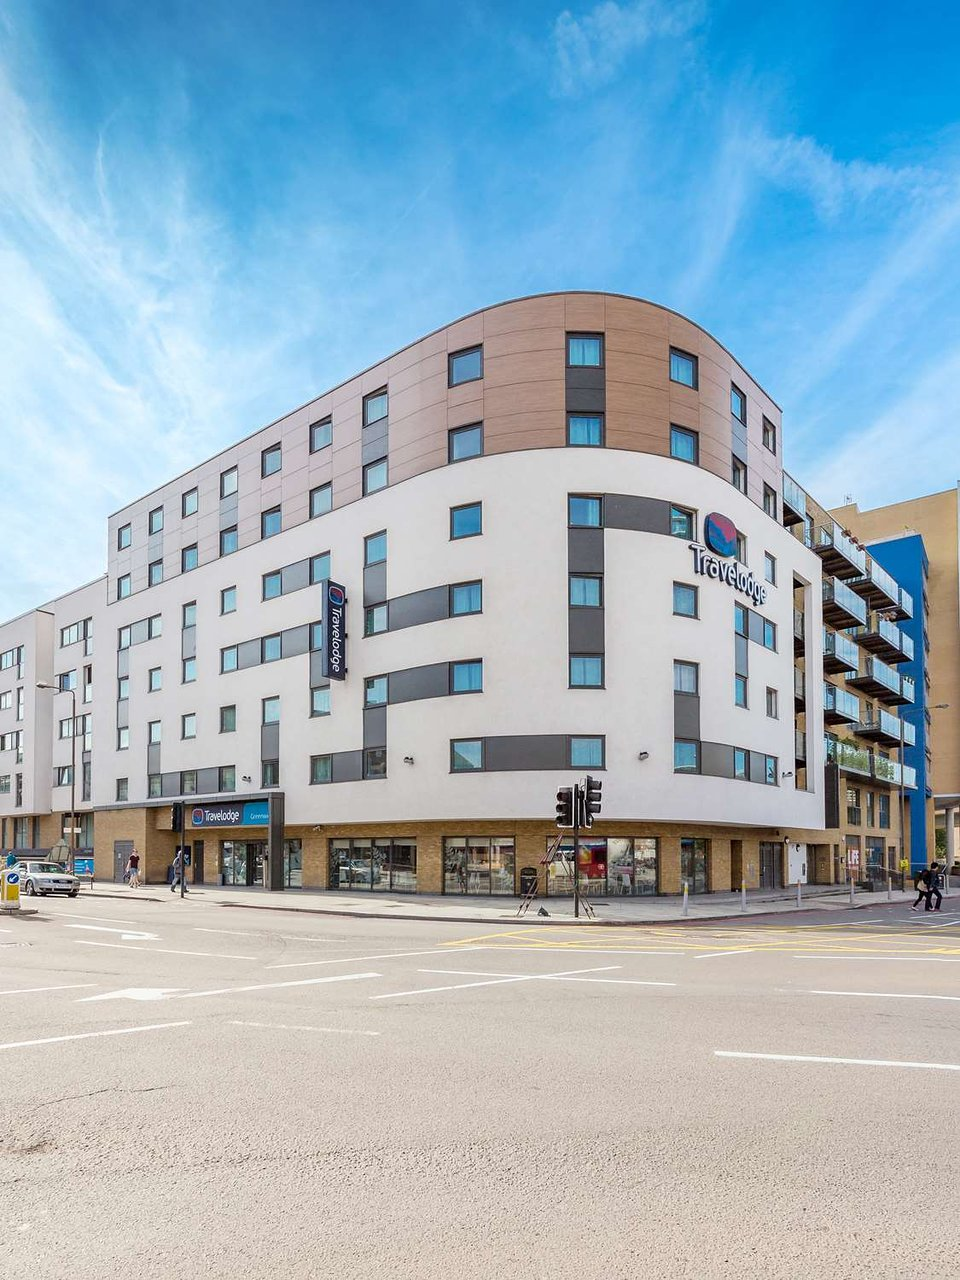 travelodge london greenwich updated 2019 prices hotel reviews rh tripadvisor com